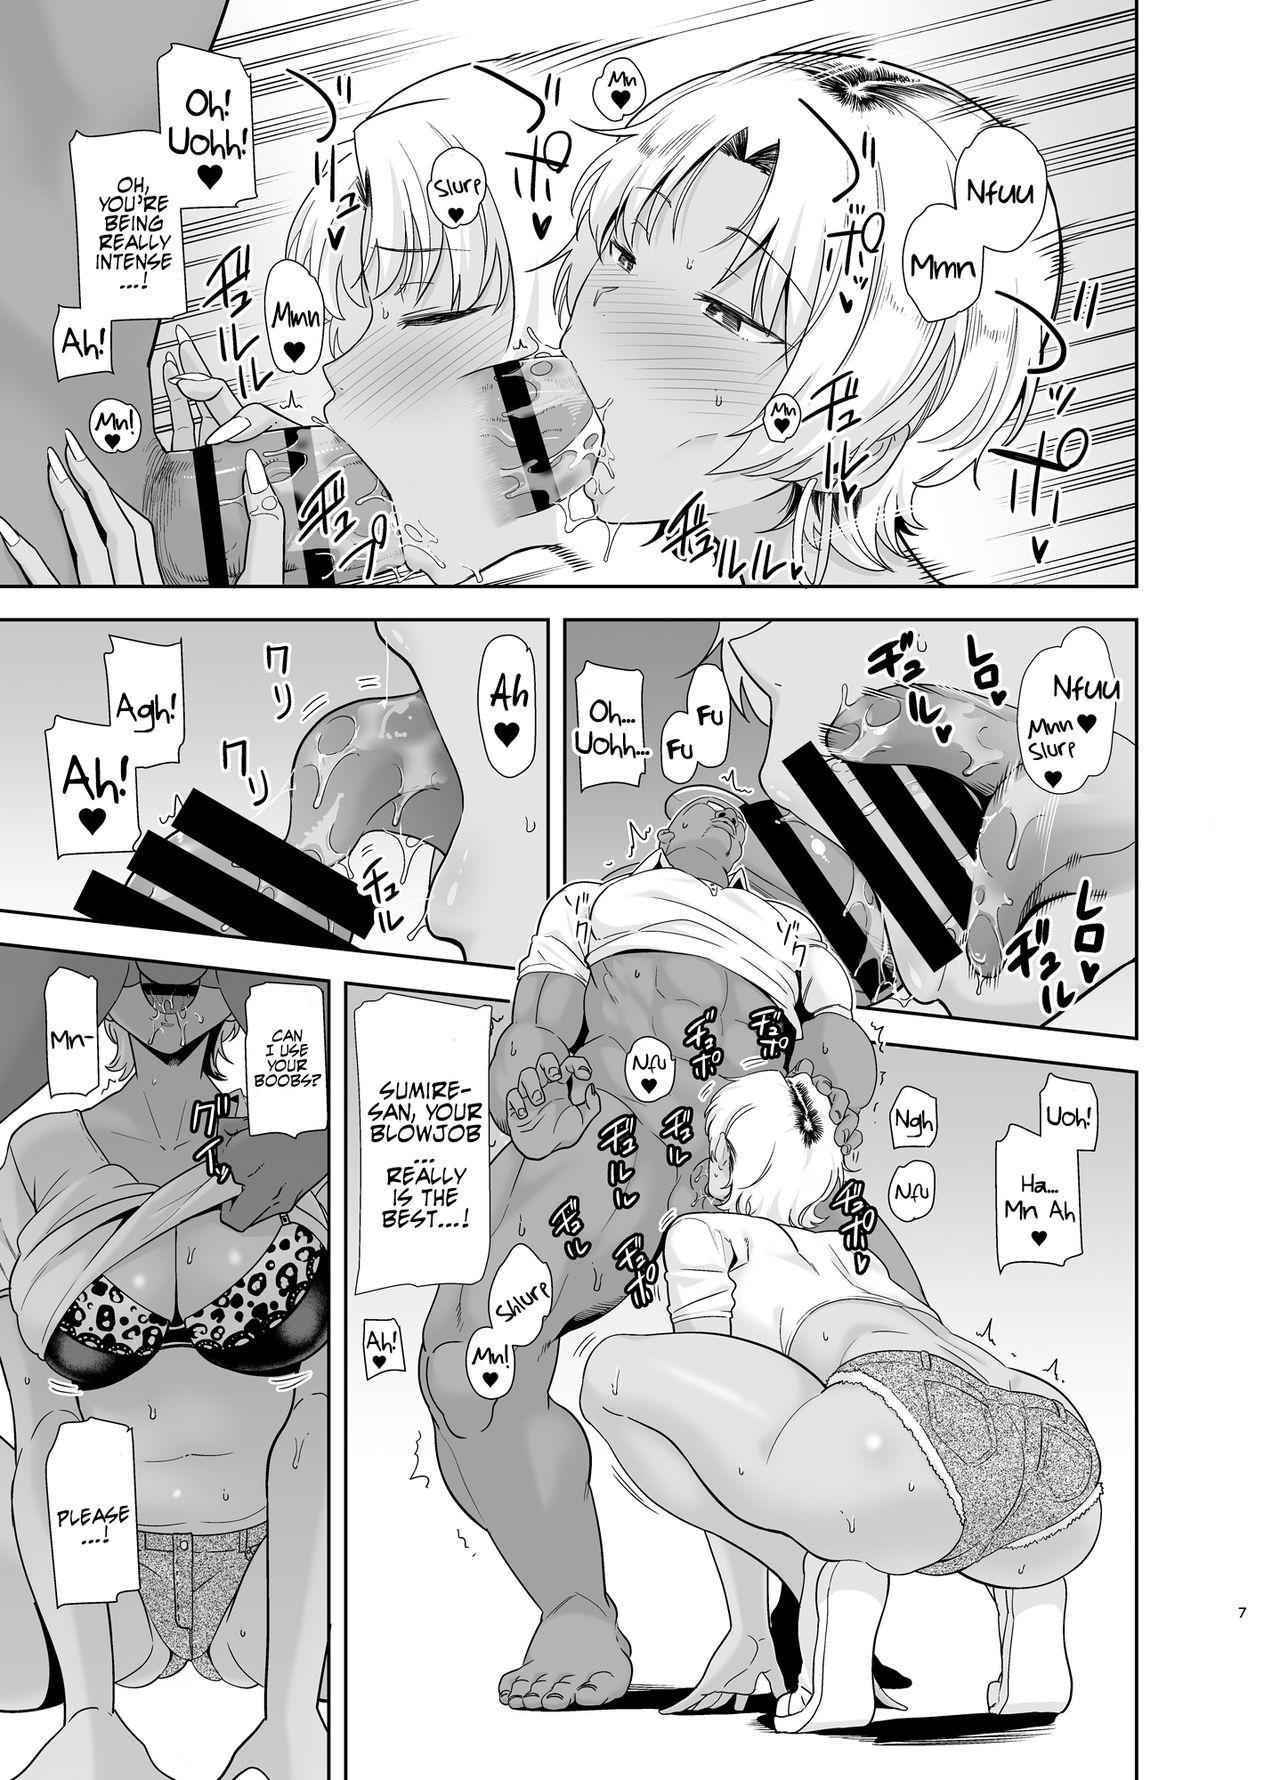 [DOLL PLAY (Kurosu Gatari)] Wild-shiki Nihonjin Tsuma no Netorikata Sono Ni | Wild Method - How to Steal a Japanese Housewife - Part Two [English] [Coffedrug] [Digital] 5